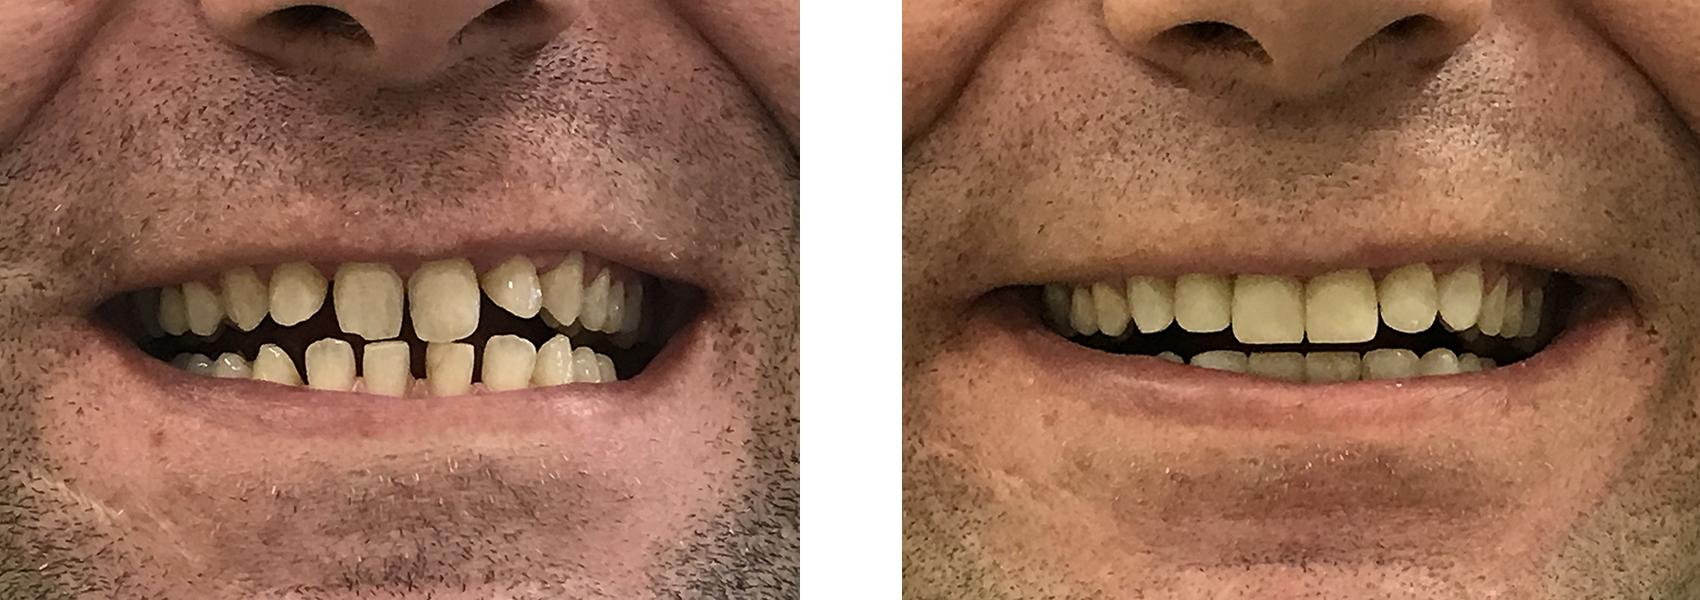 bonding δοντιών 2η εικόνα